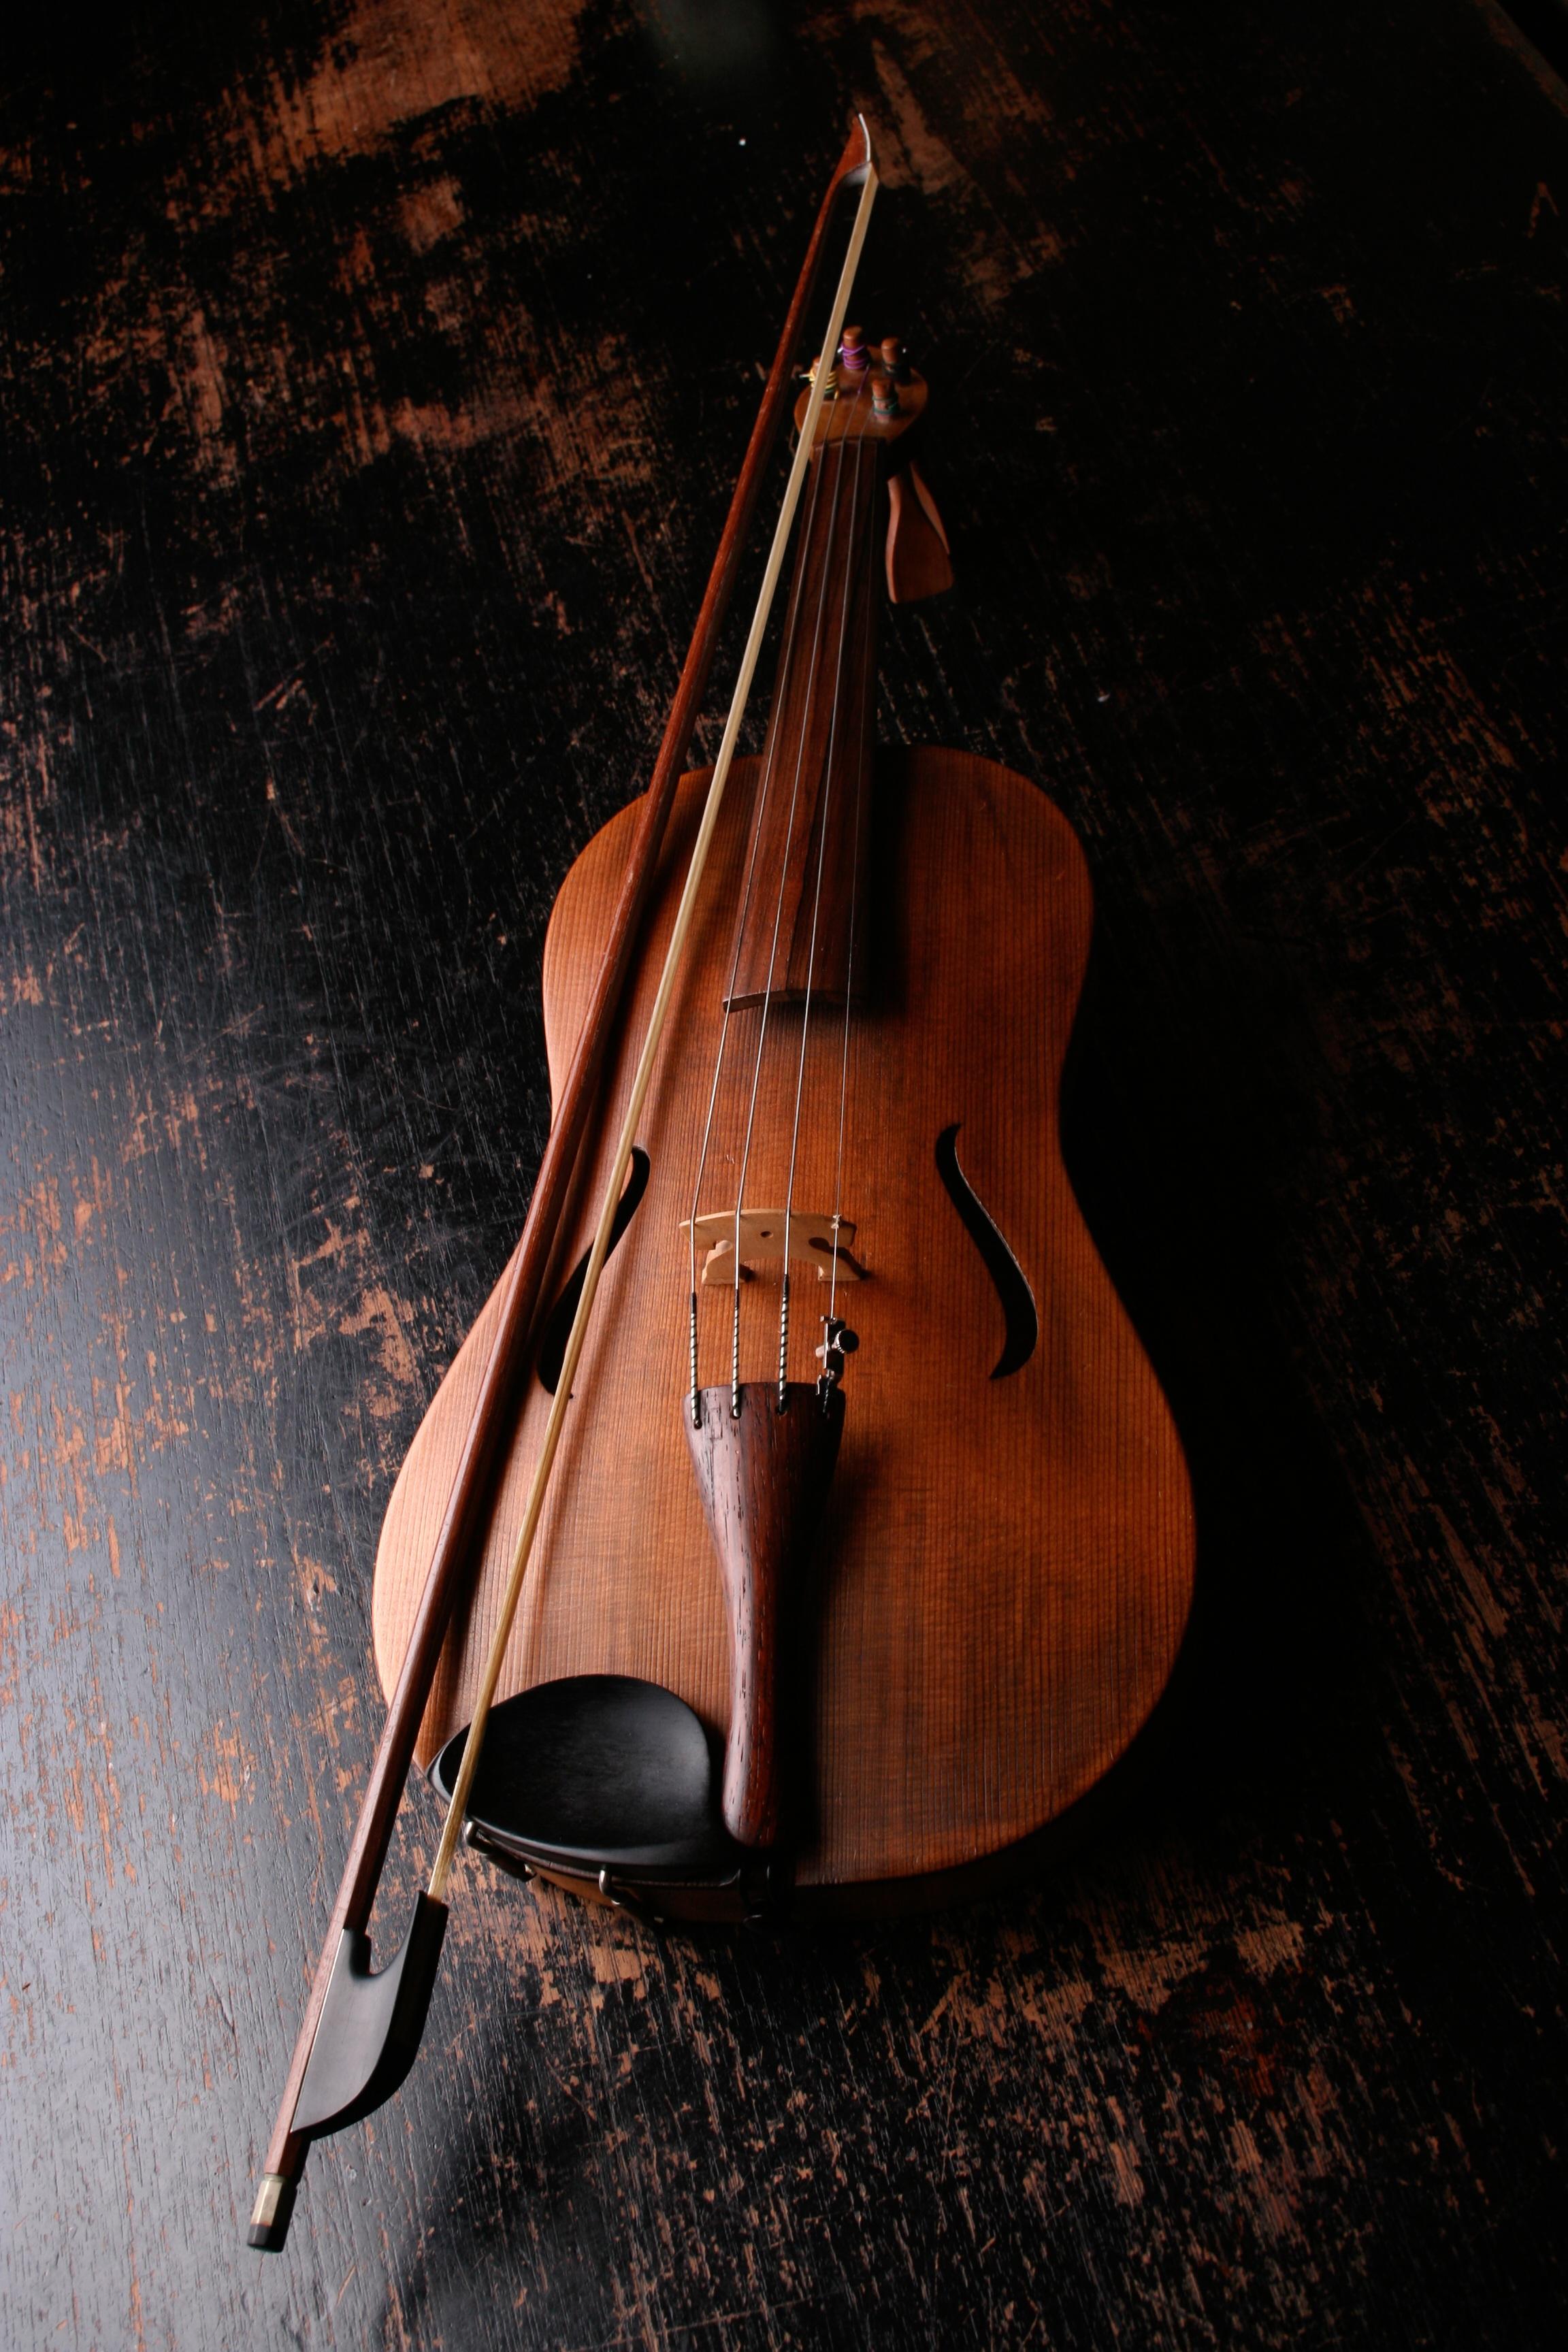 Brown Wooden Violin and Violin Bow \u00b7 Free Stock Photo